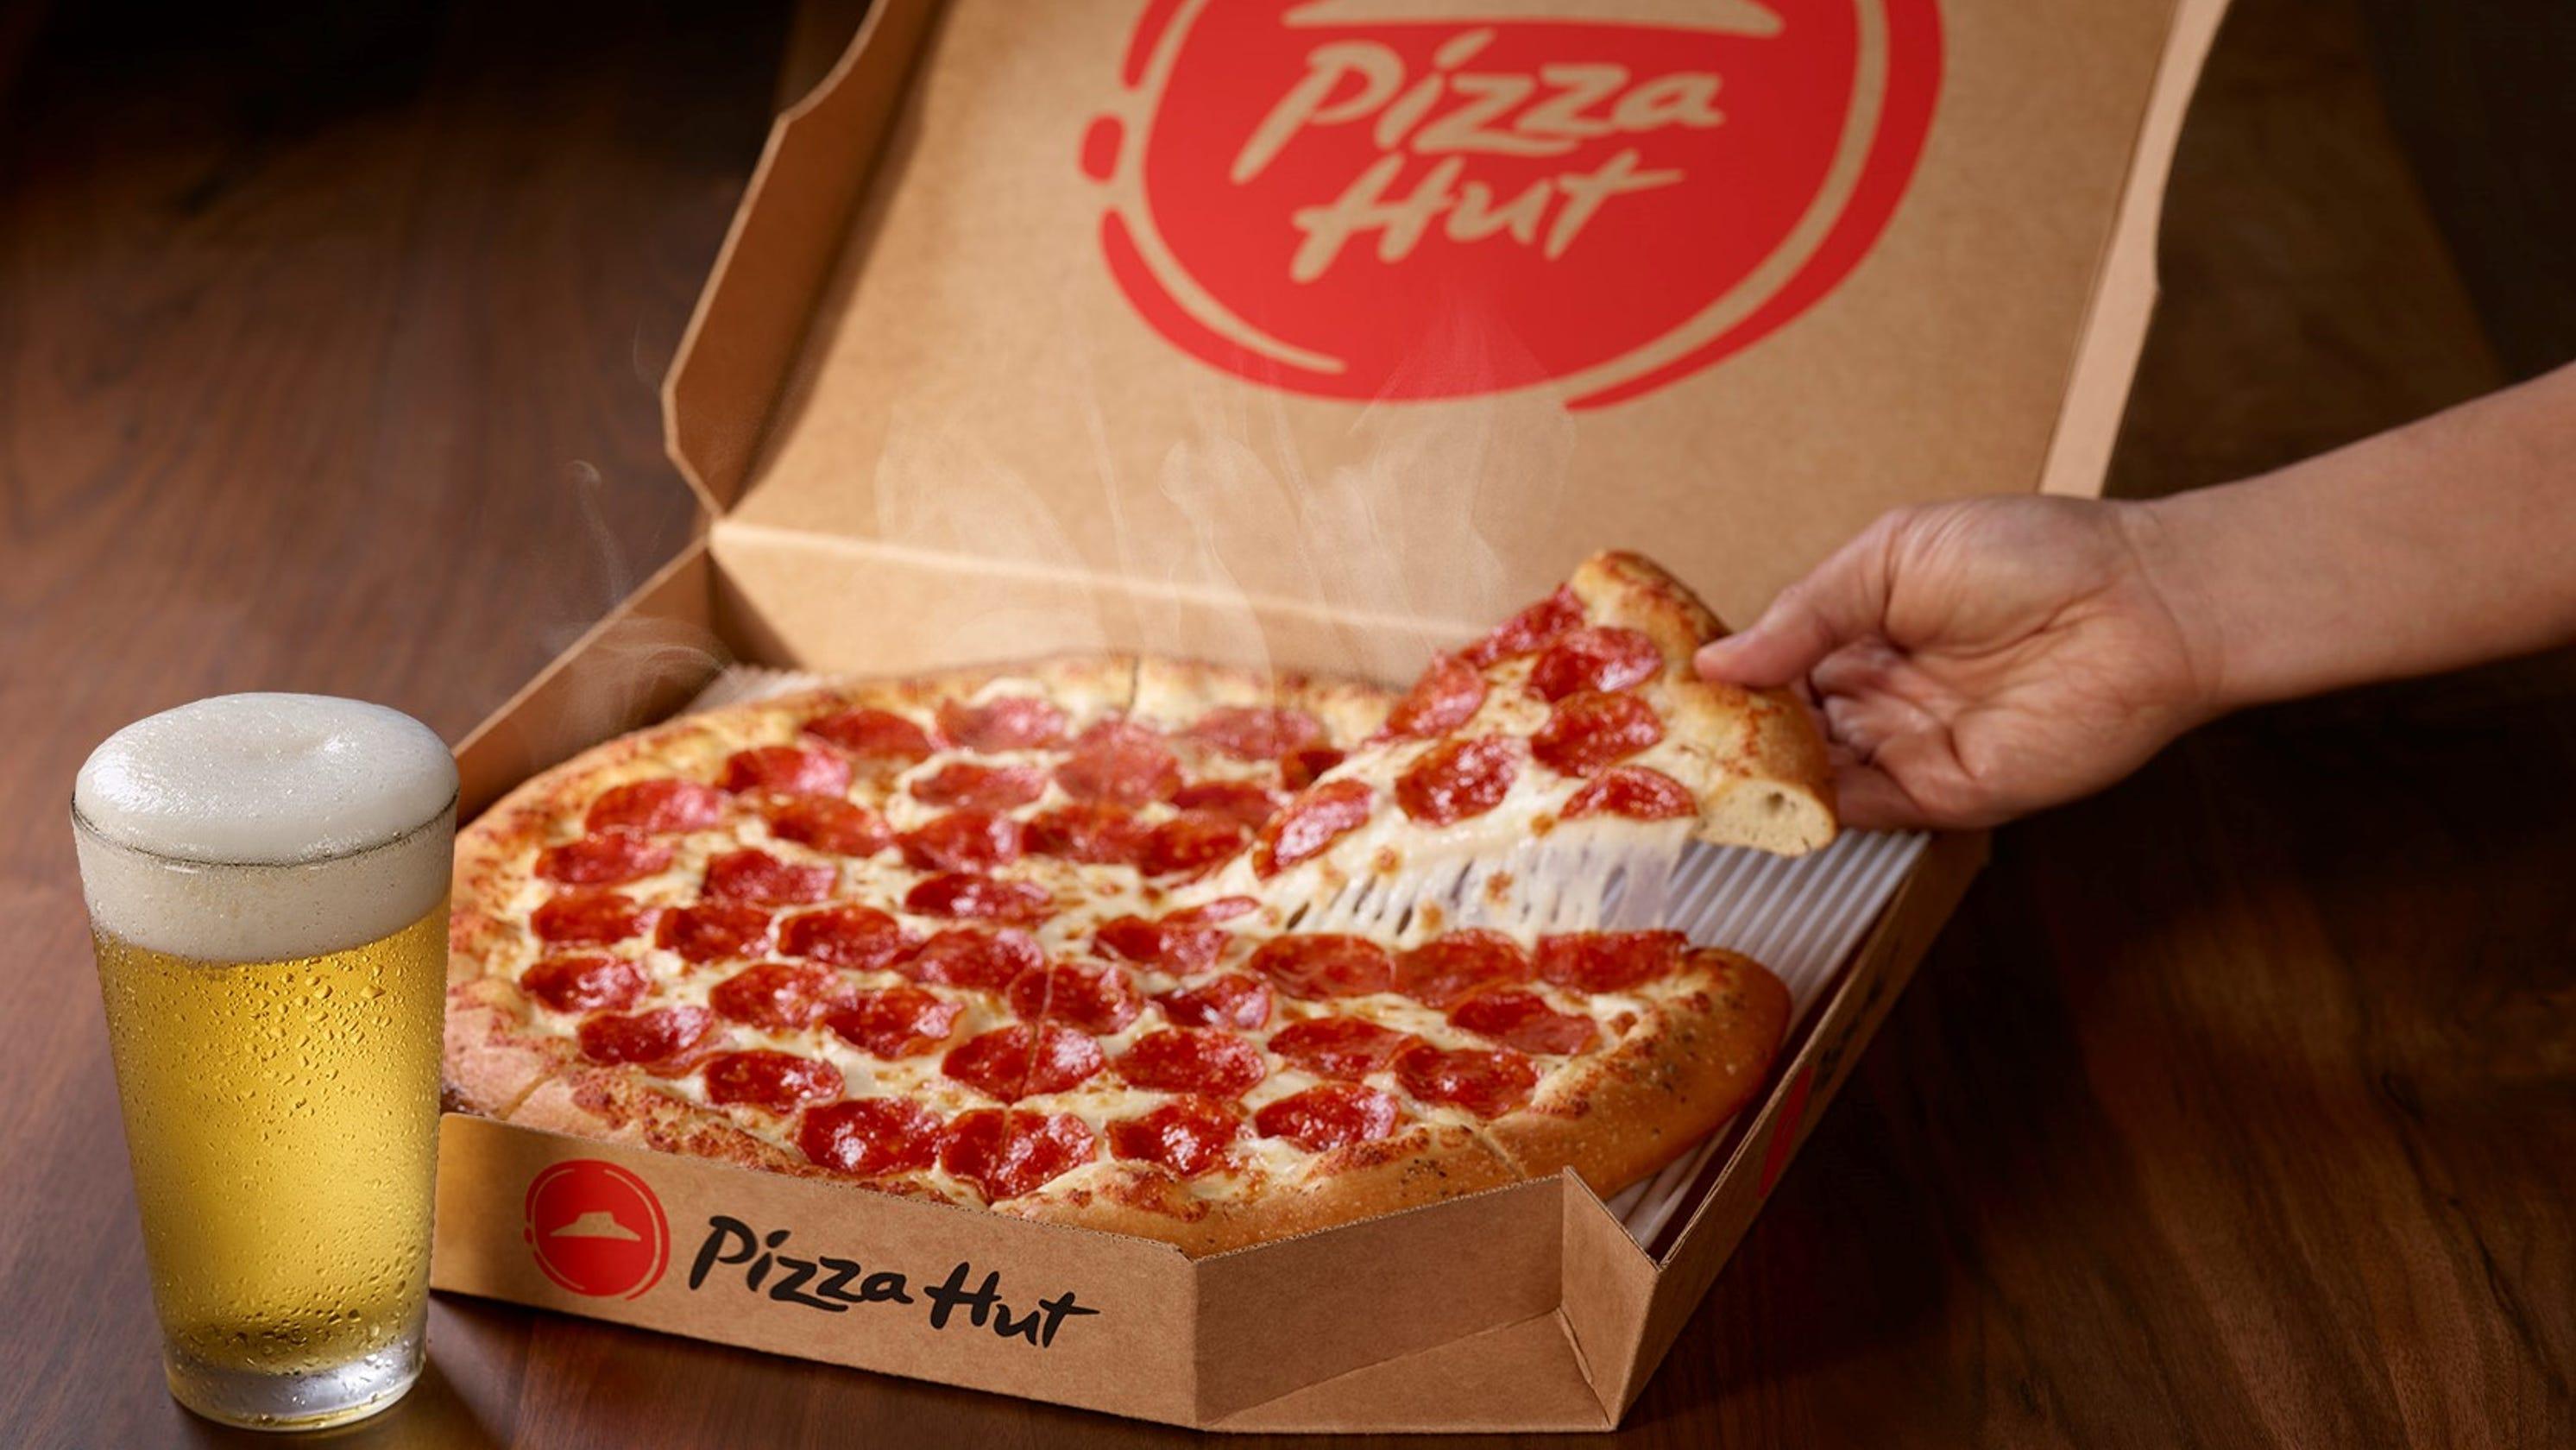 Pizza Hut Hut Gets Into Super Bowl Spirit As New Nfl Sponsor